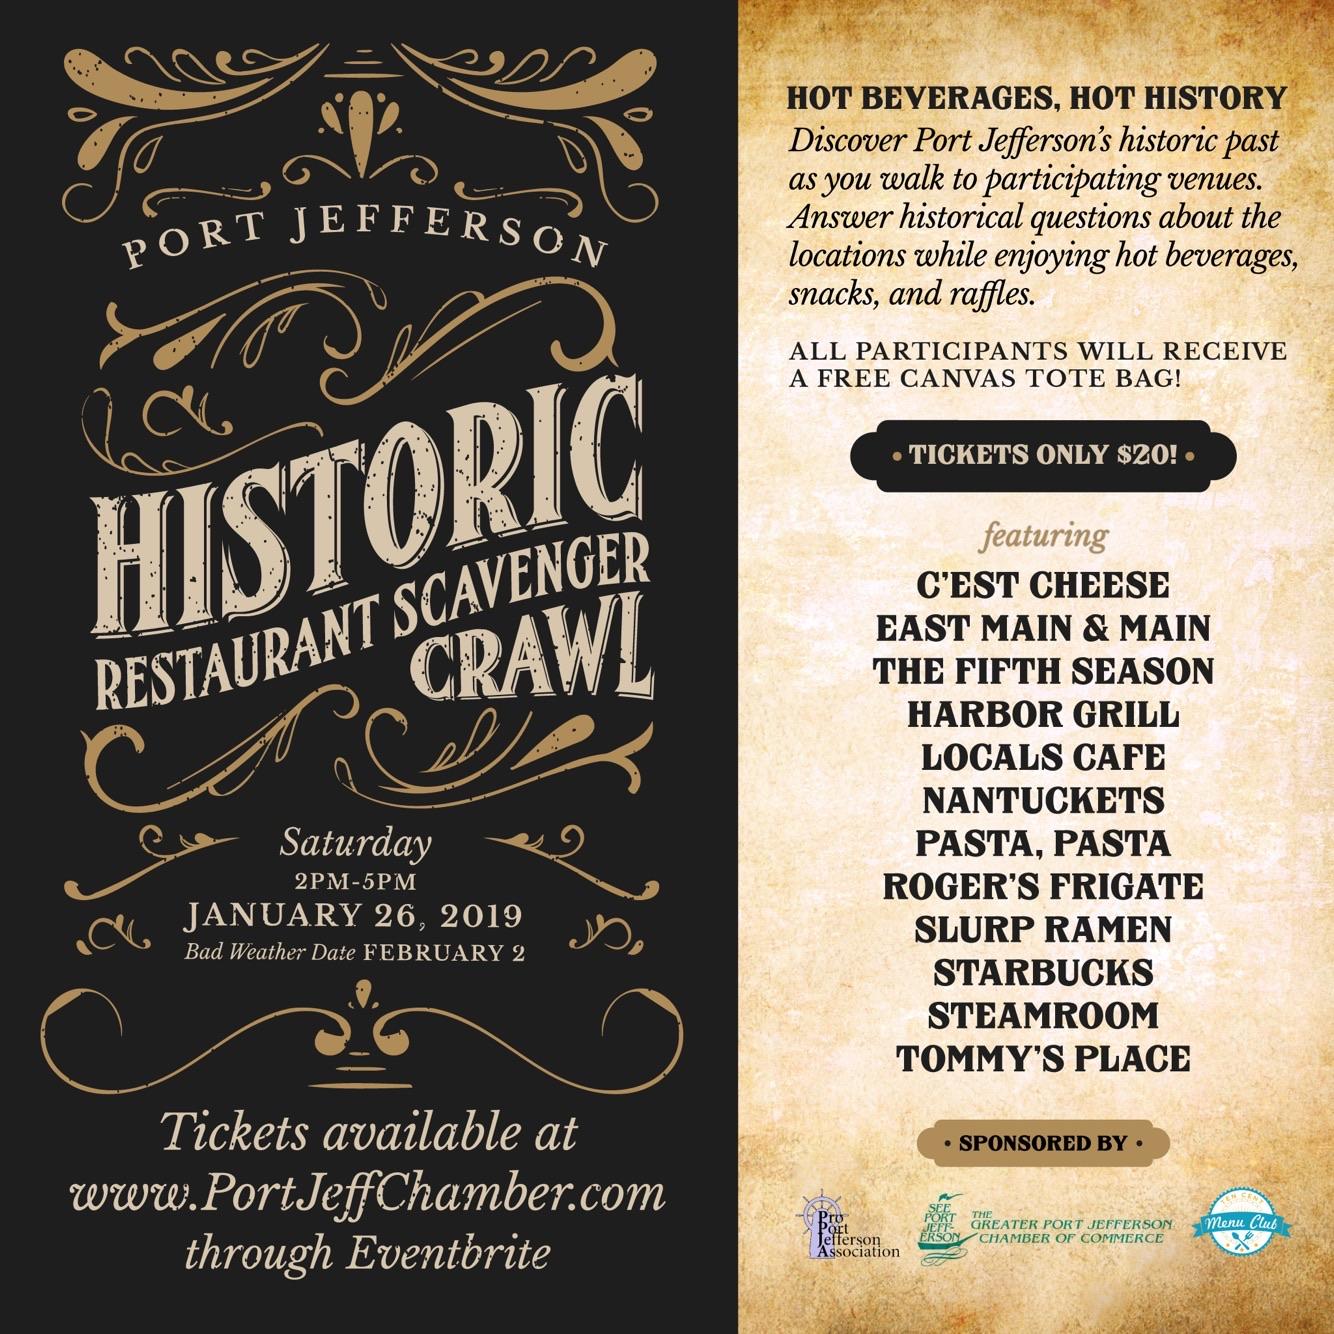 Historic Restaurant Scavenger Crawl 2019